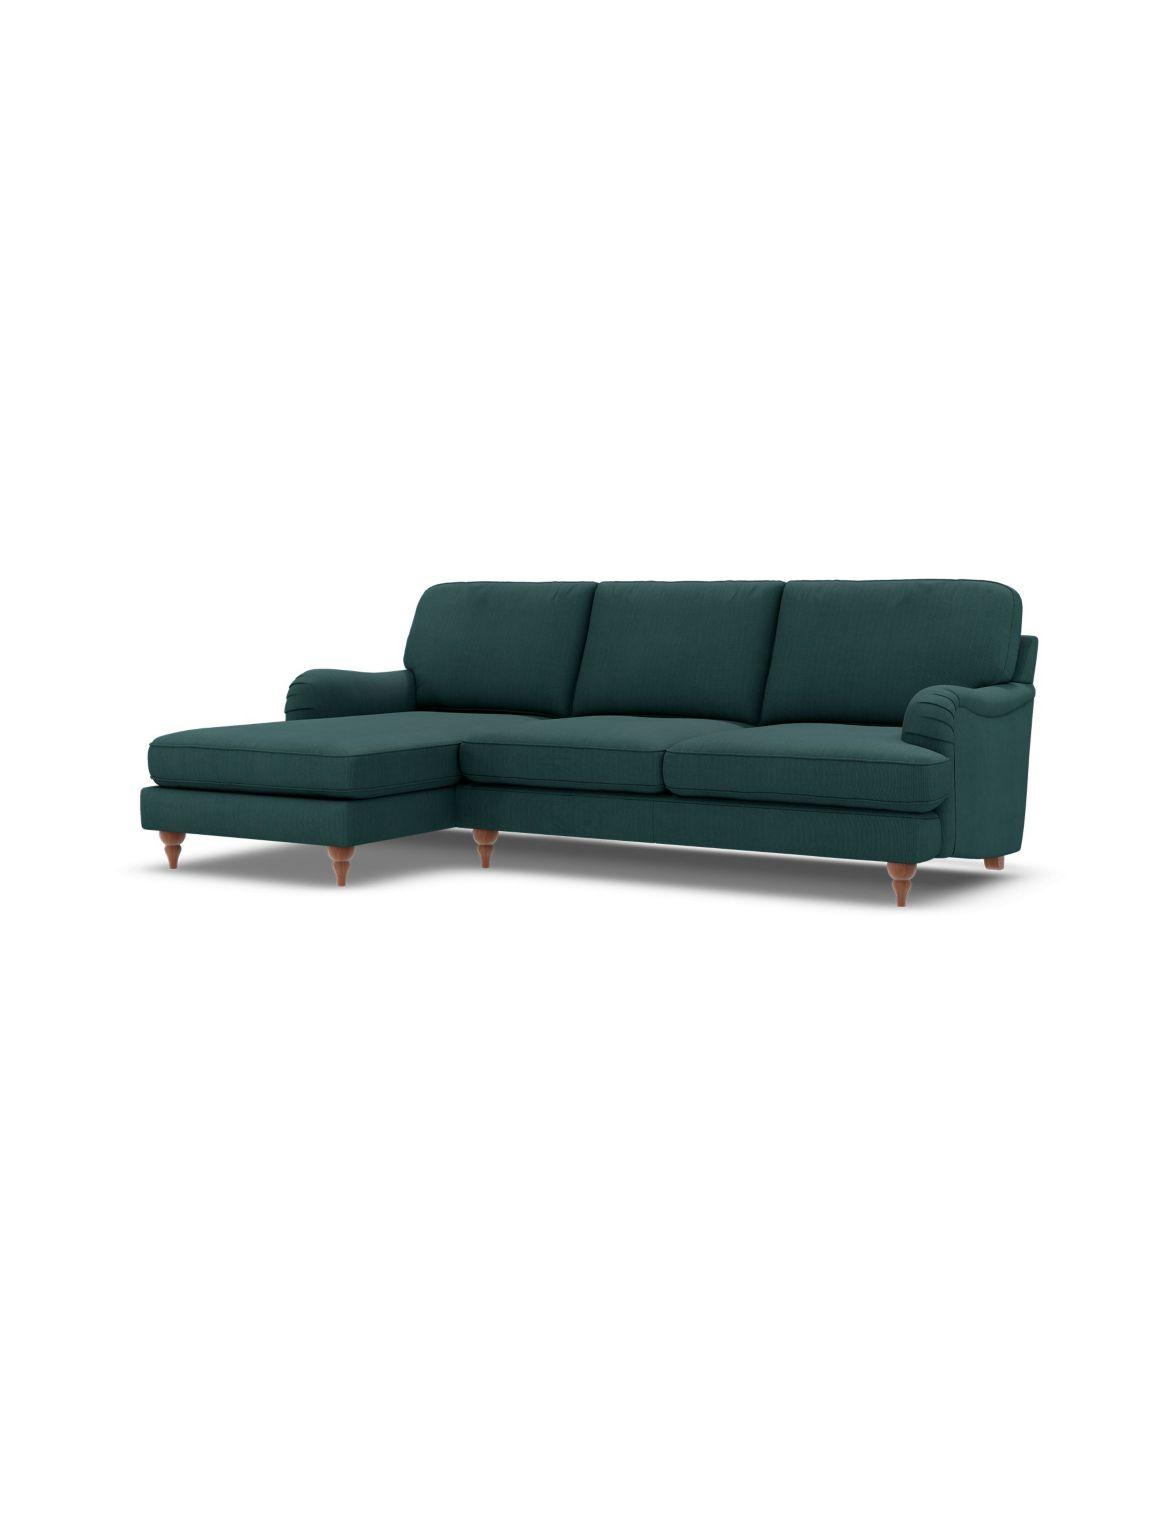 Rochester Corner Chaise Sofa (Left-Hand) Green